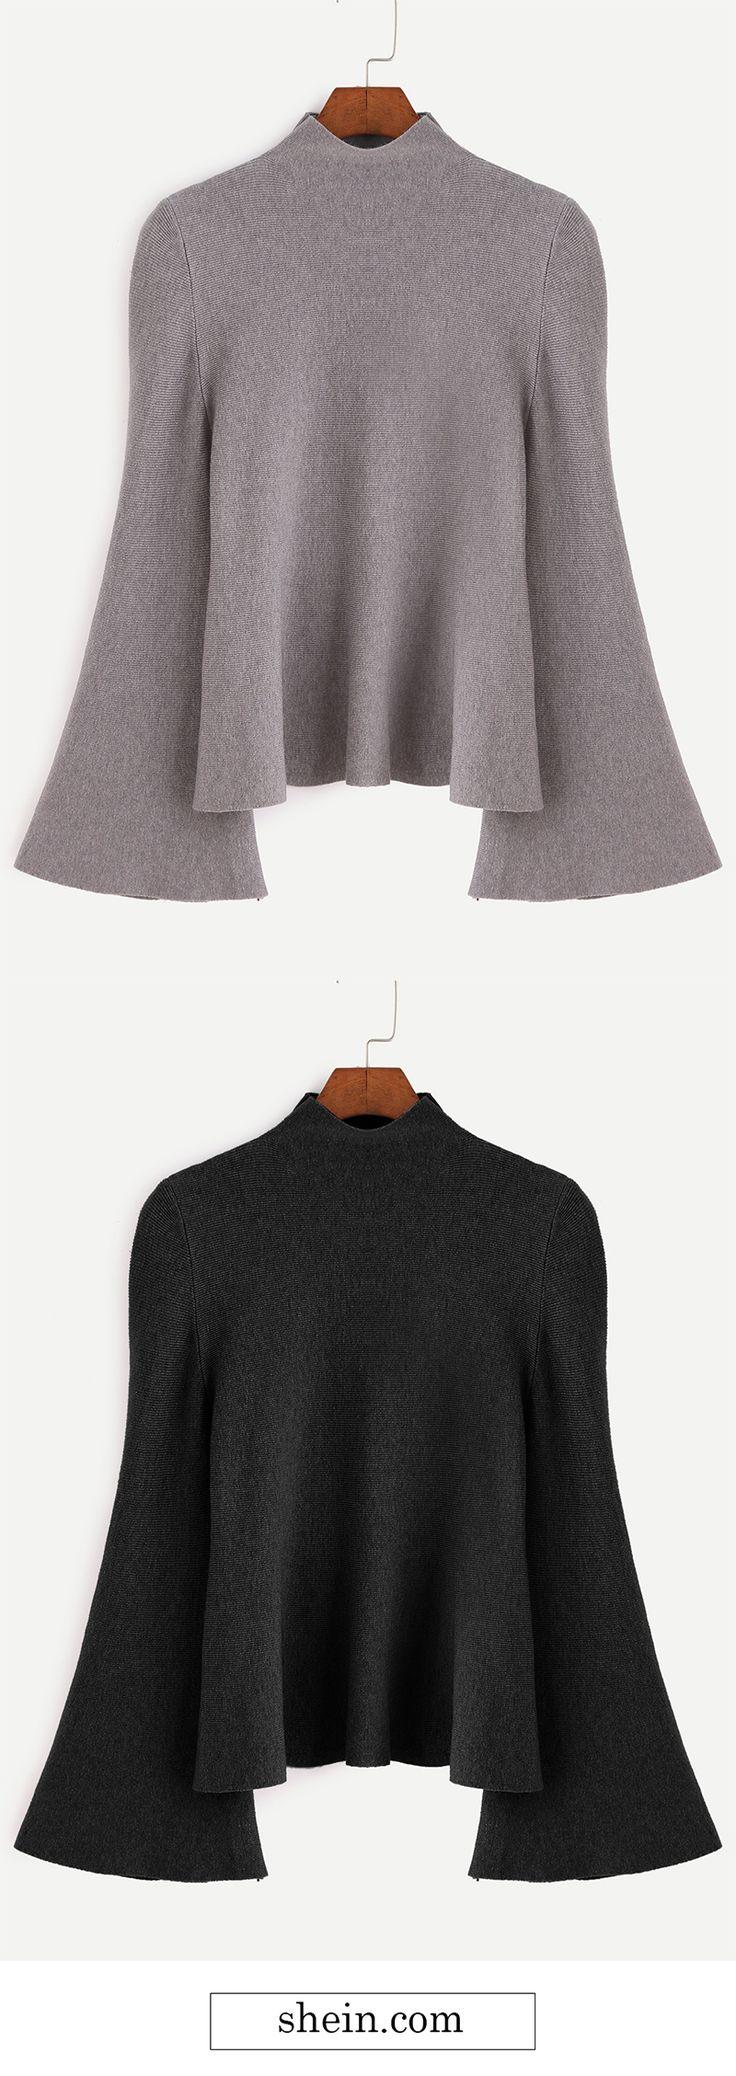 Mock Neck Bell Sleeve Jersey Sweater.